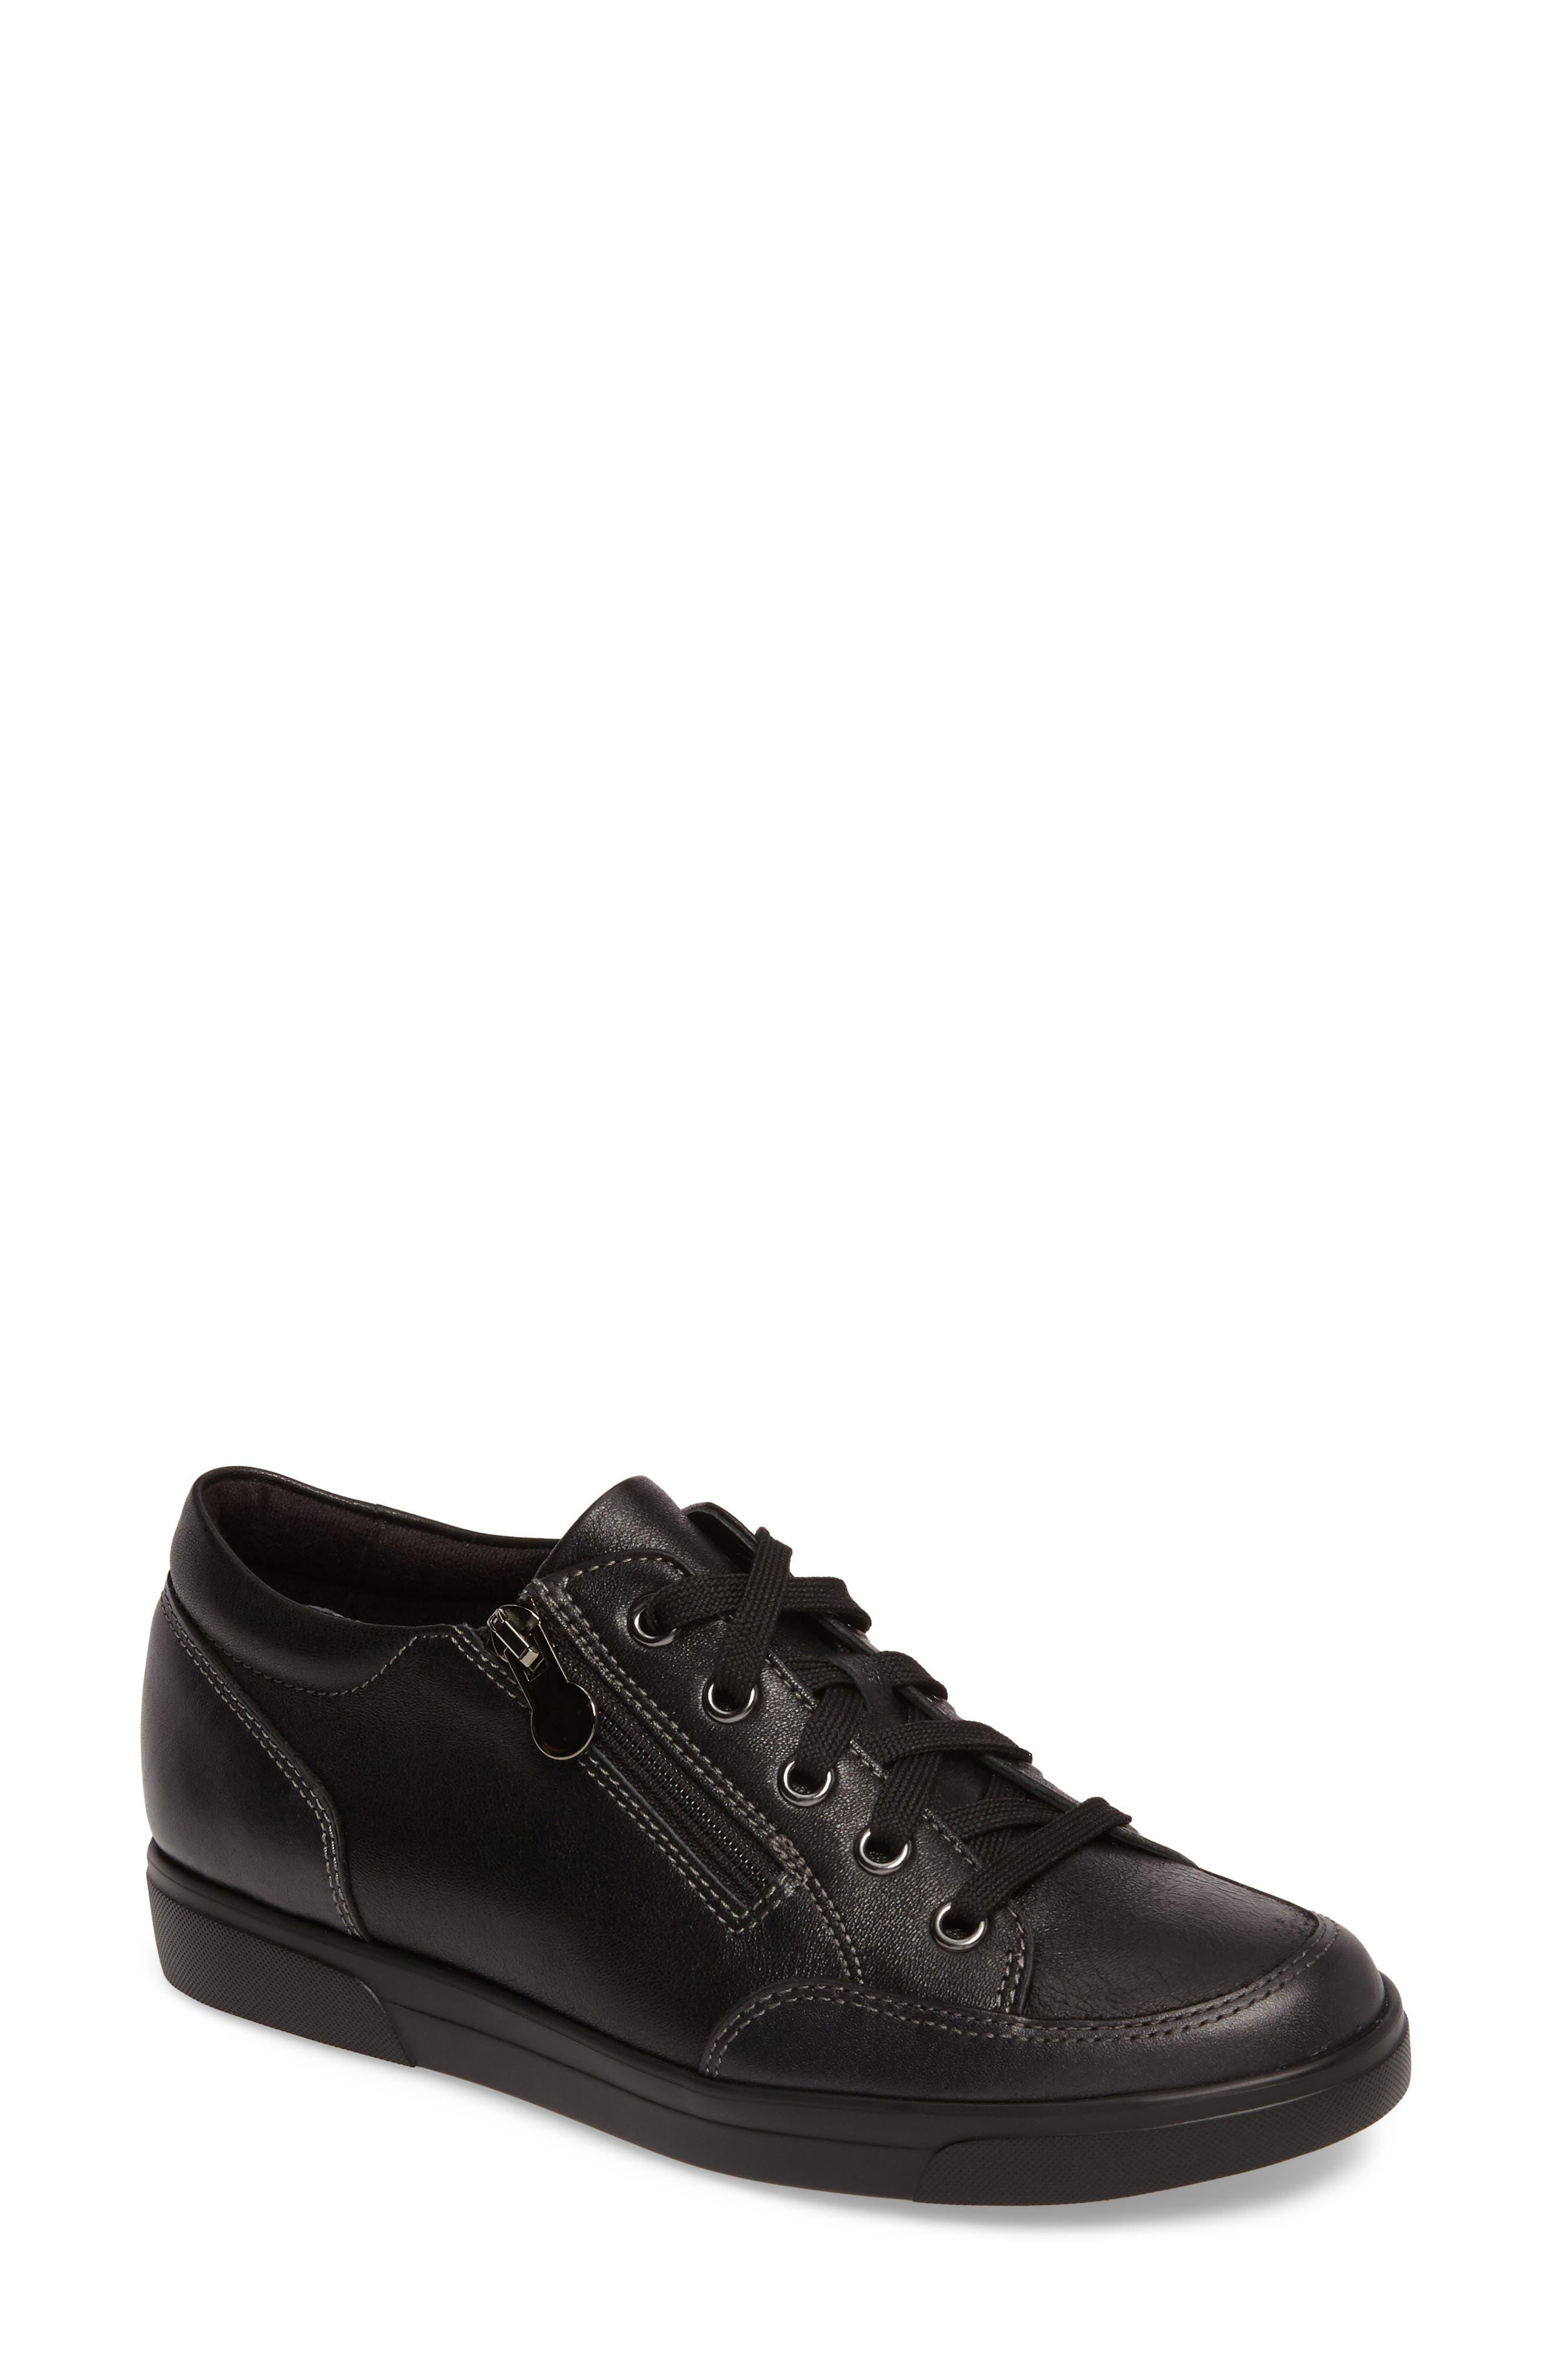 Alternate Image 1 Selected - Munro Gabbie Sneaker (Women)